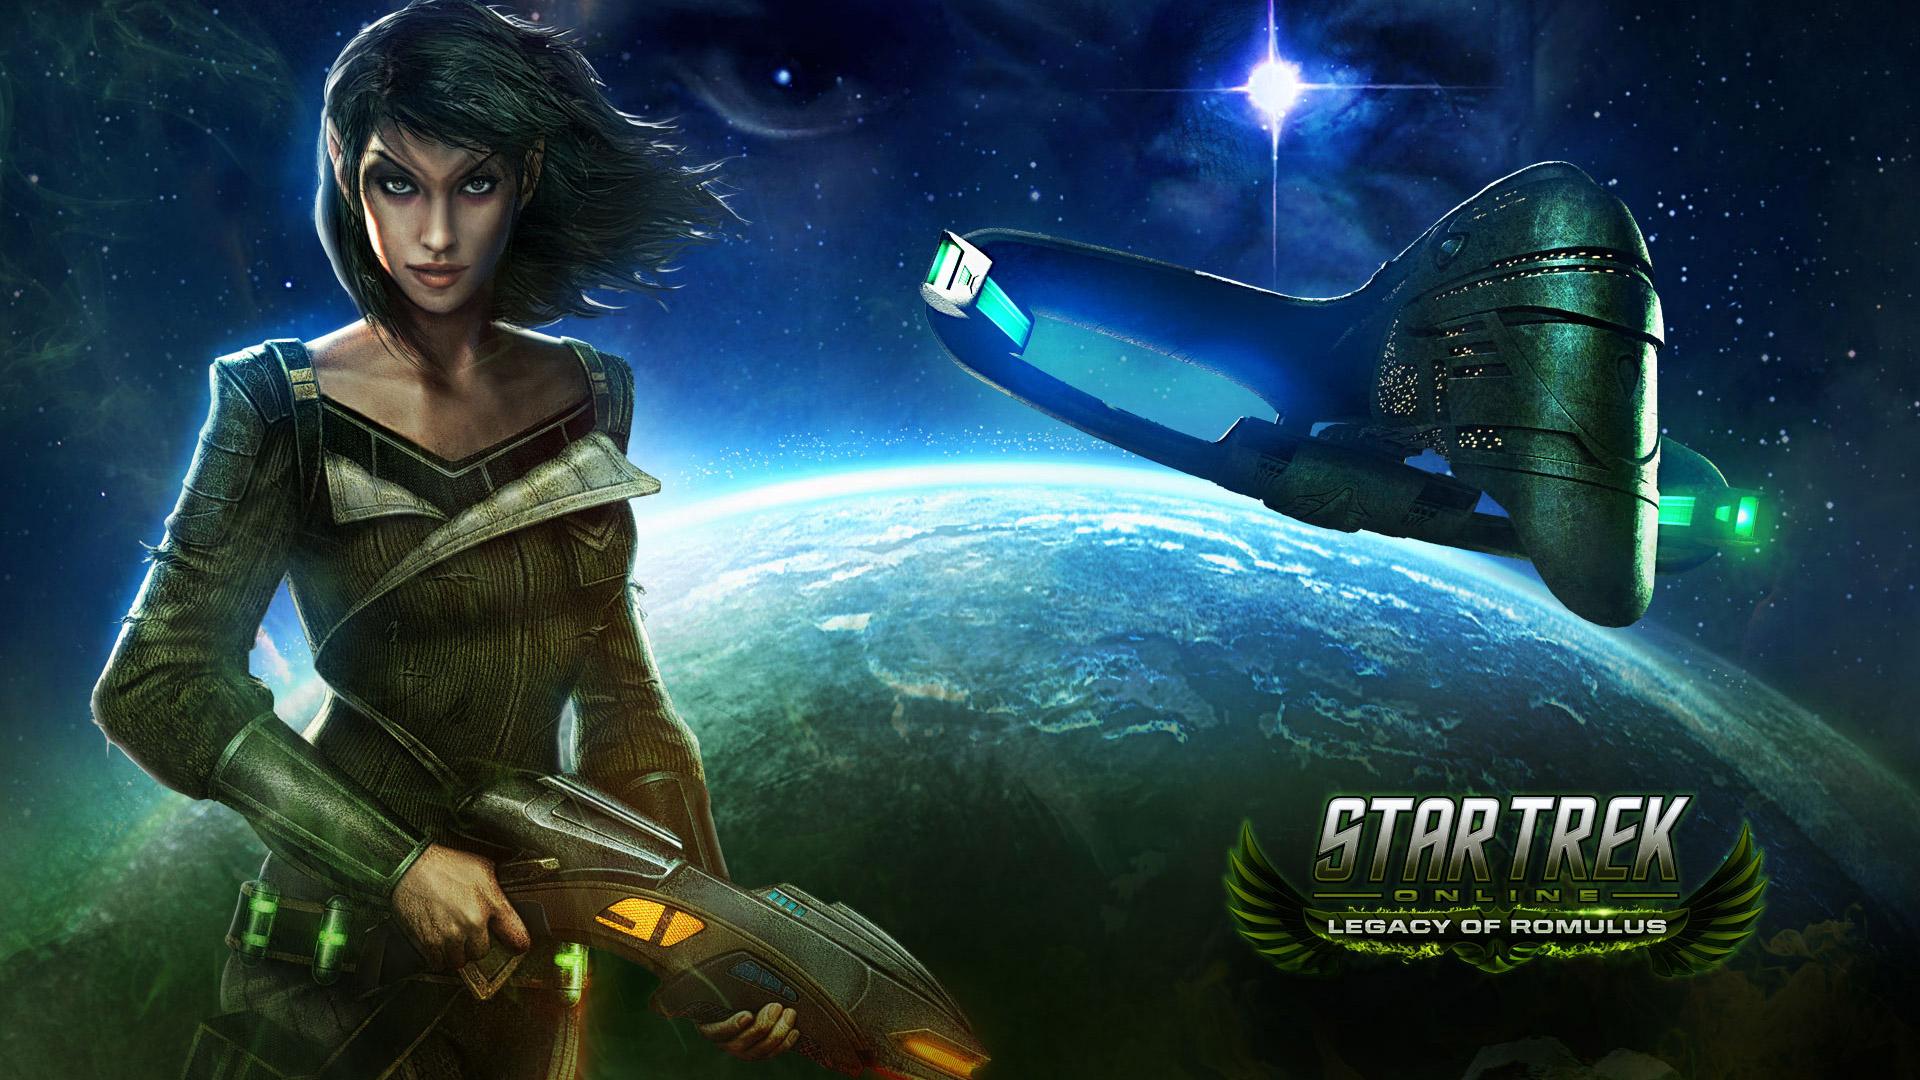 Free Star Trek Online Wallpaper in 1920x1080